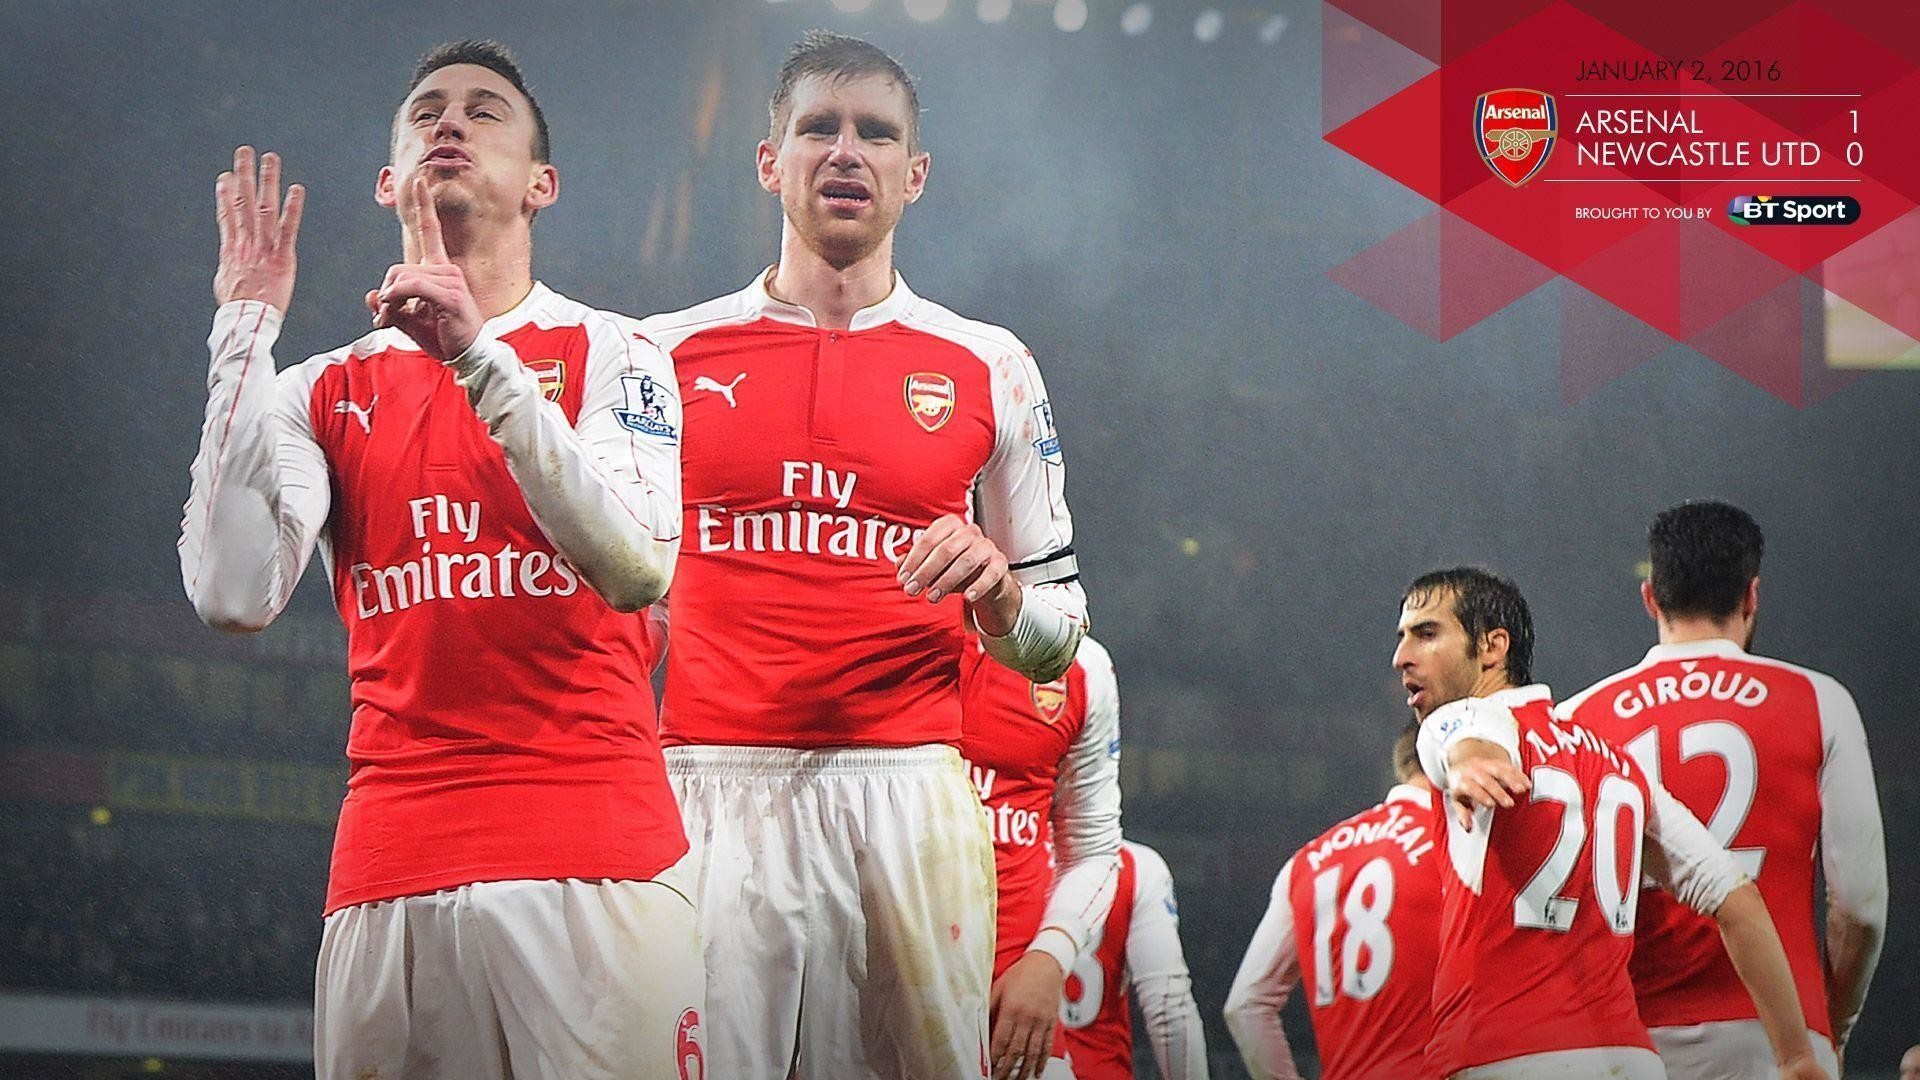 Arsenal Wallpaper 2018 86 Images